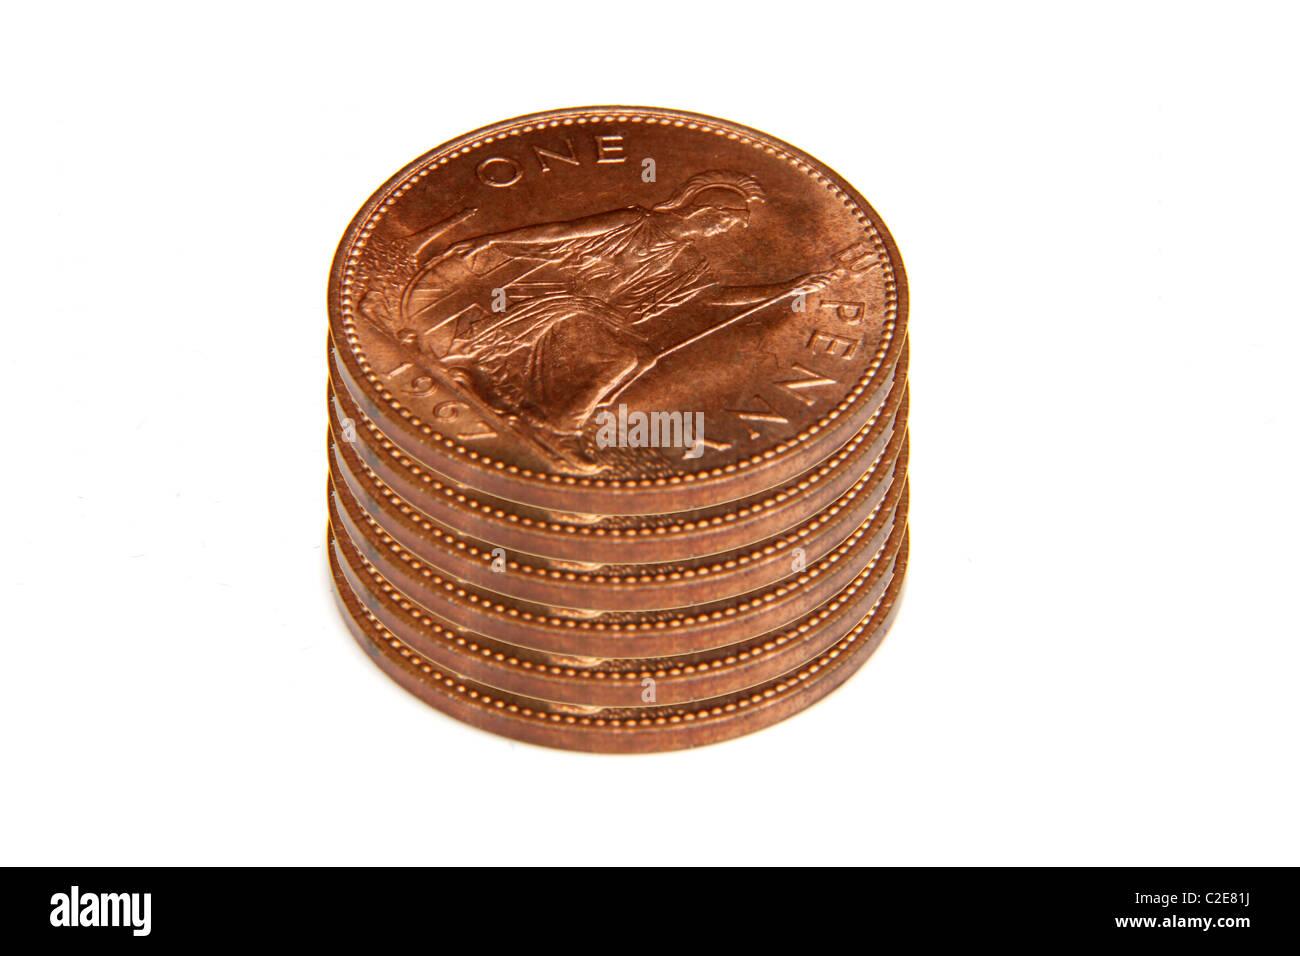 Pre Decimal Coins Stock Photos & Pre Decimal Coins Stock